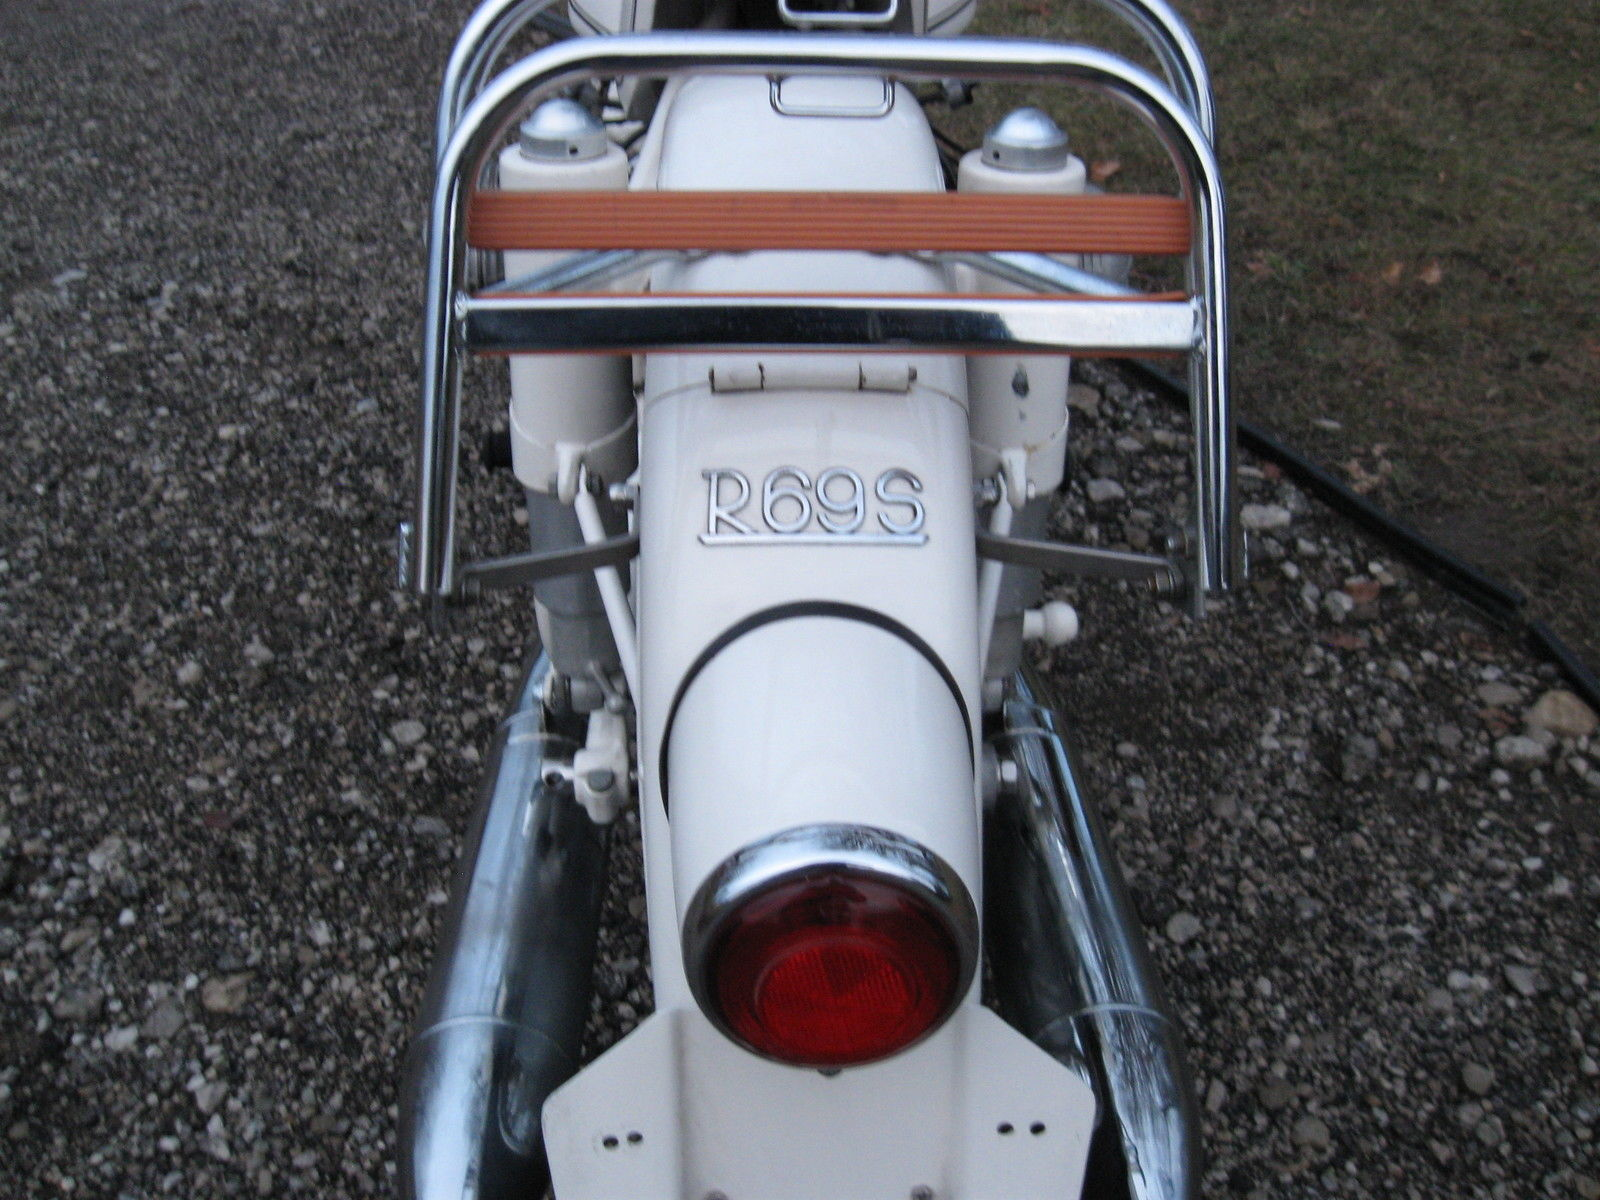 BMW R69S - 1966 - Rear Rack, Rear Light, Tail Light and Fender.